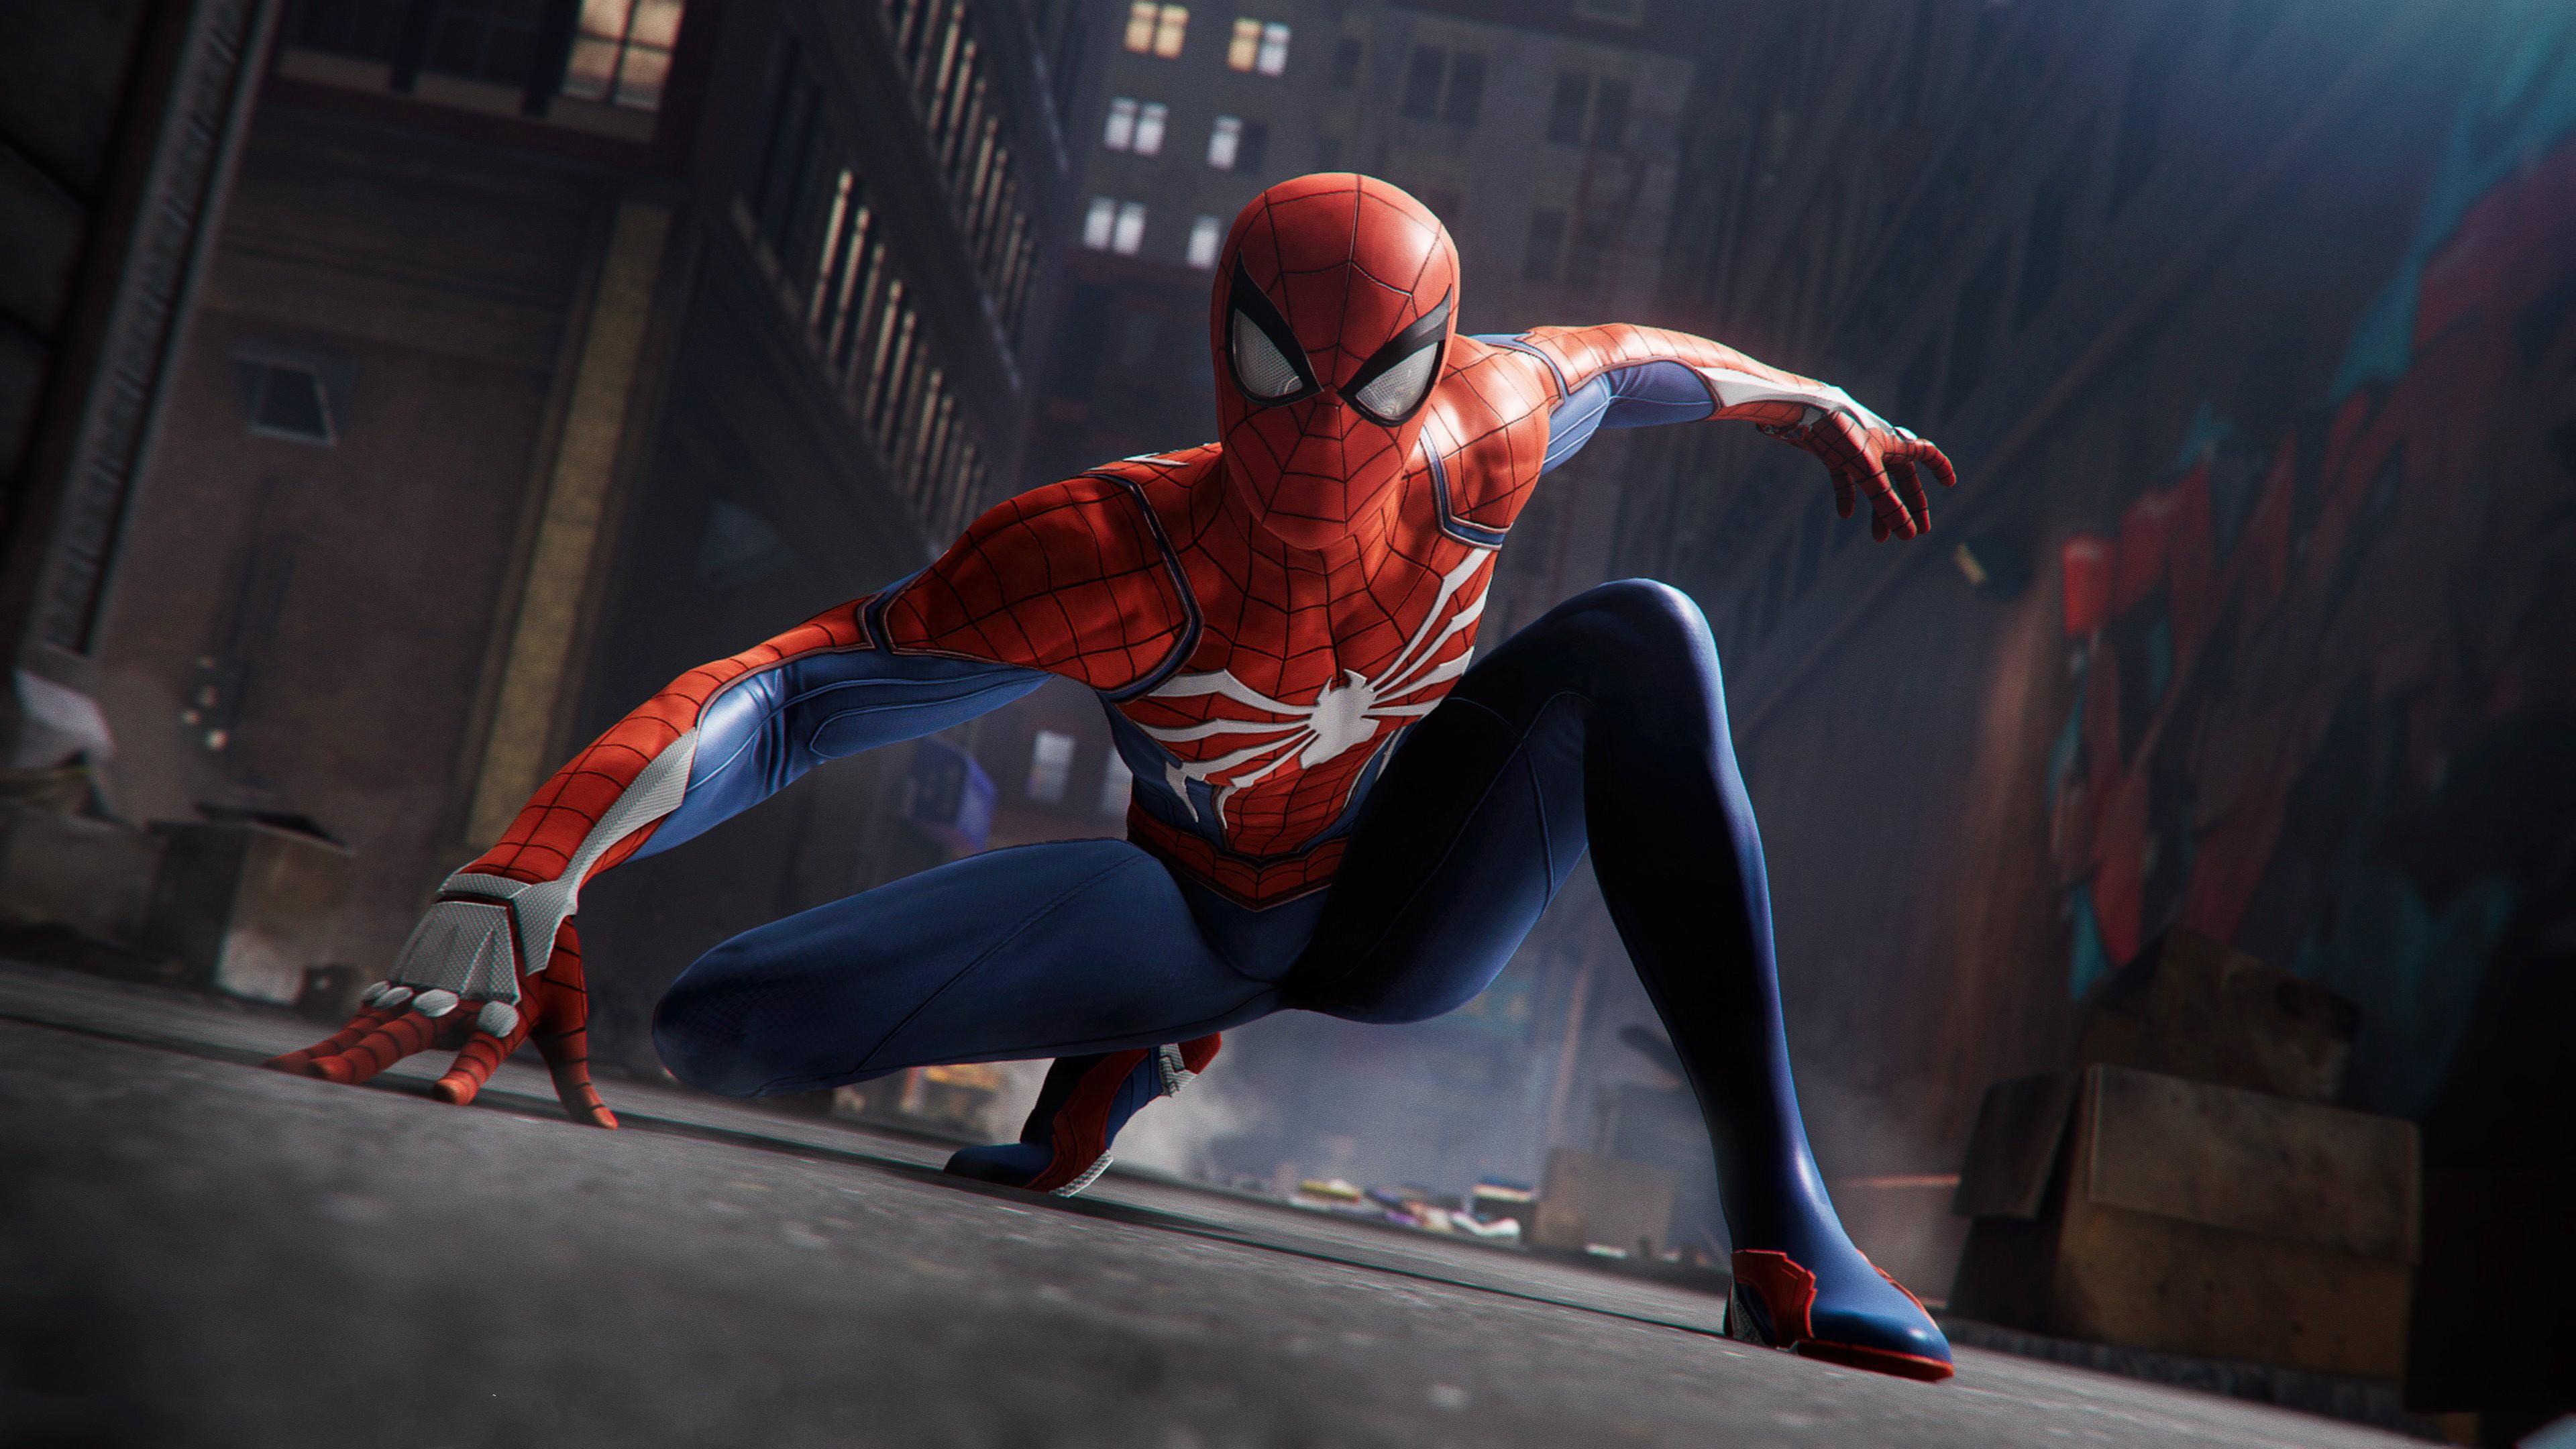 Spider Man In Avengers Infinity War Film 4k Wallpapers